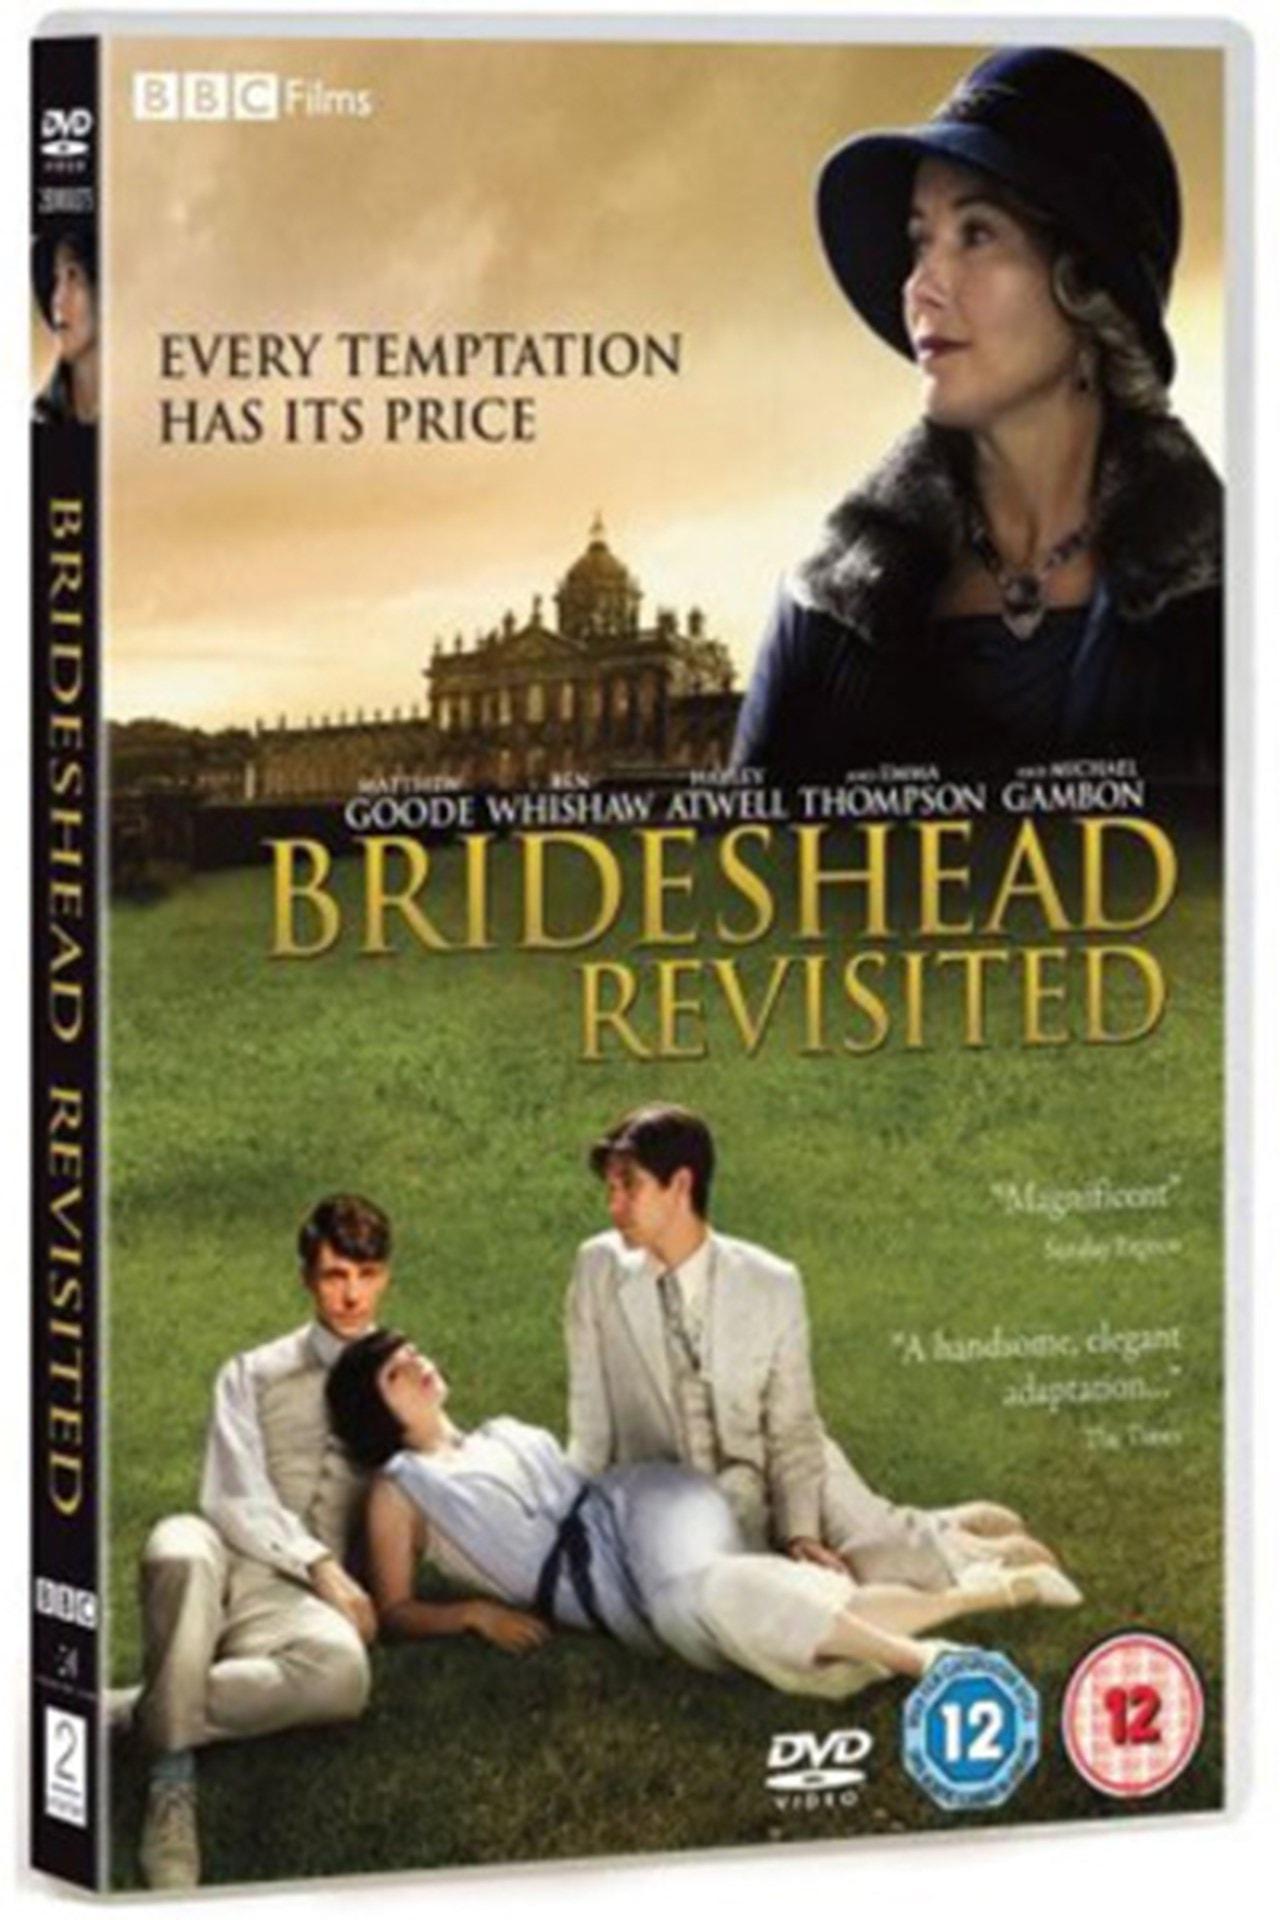 Brideshead Revisited - 1